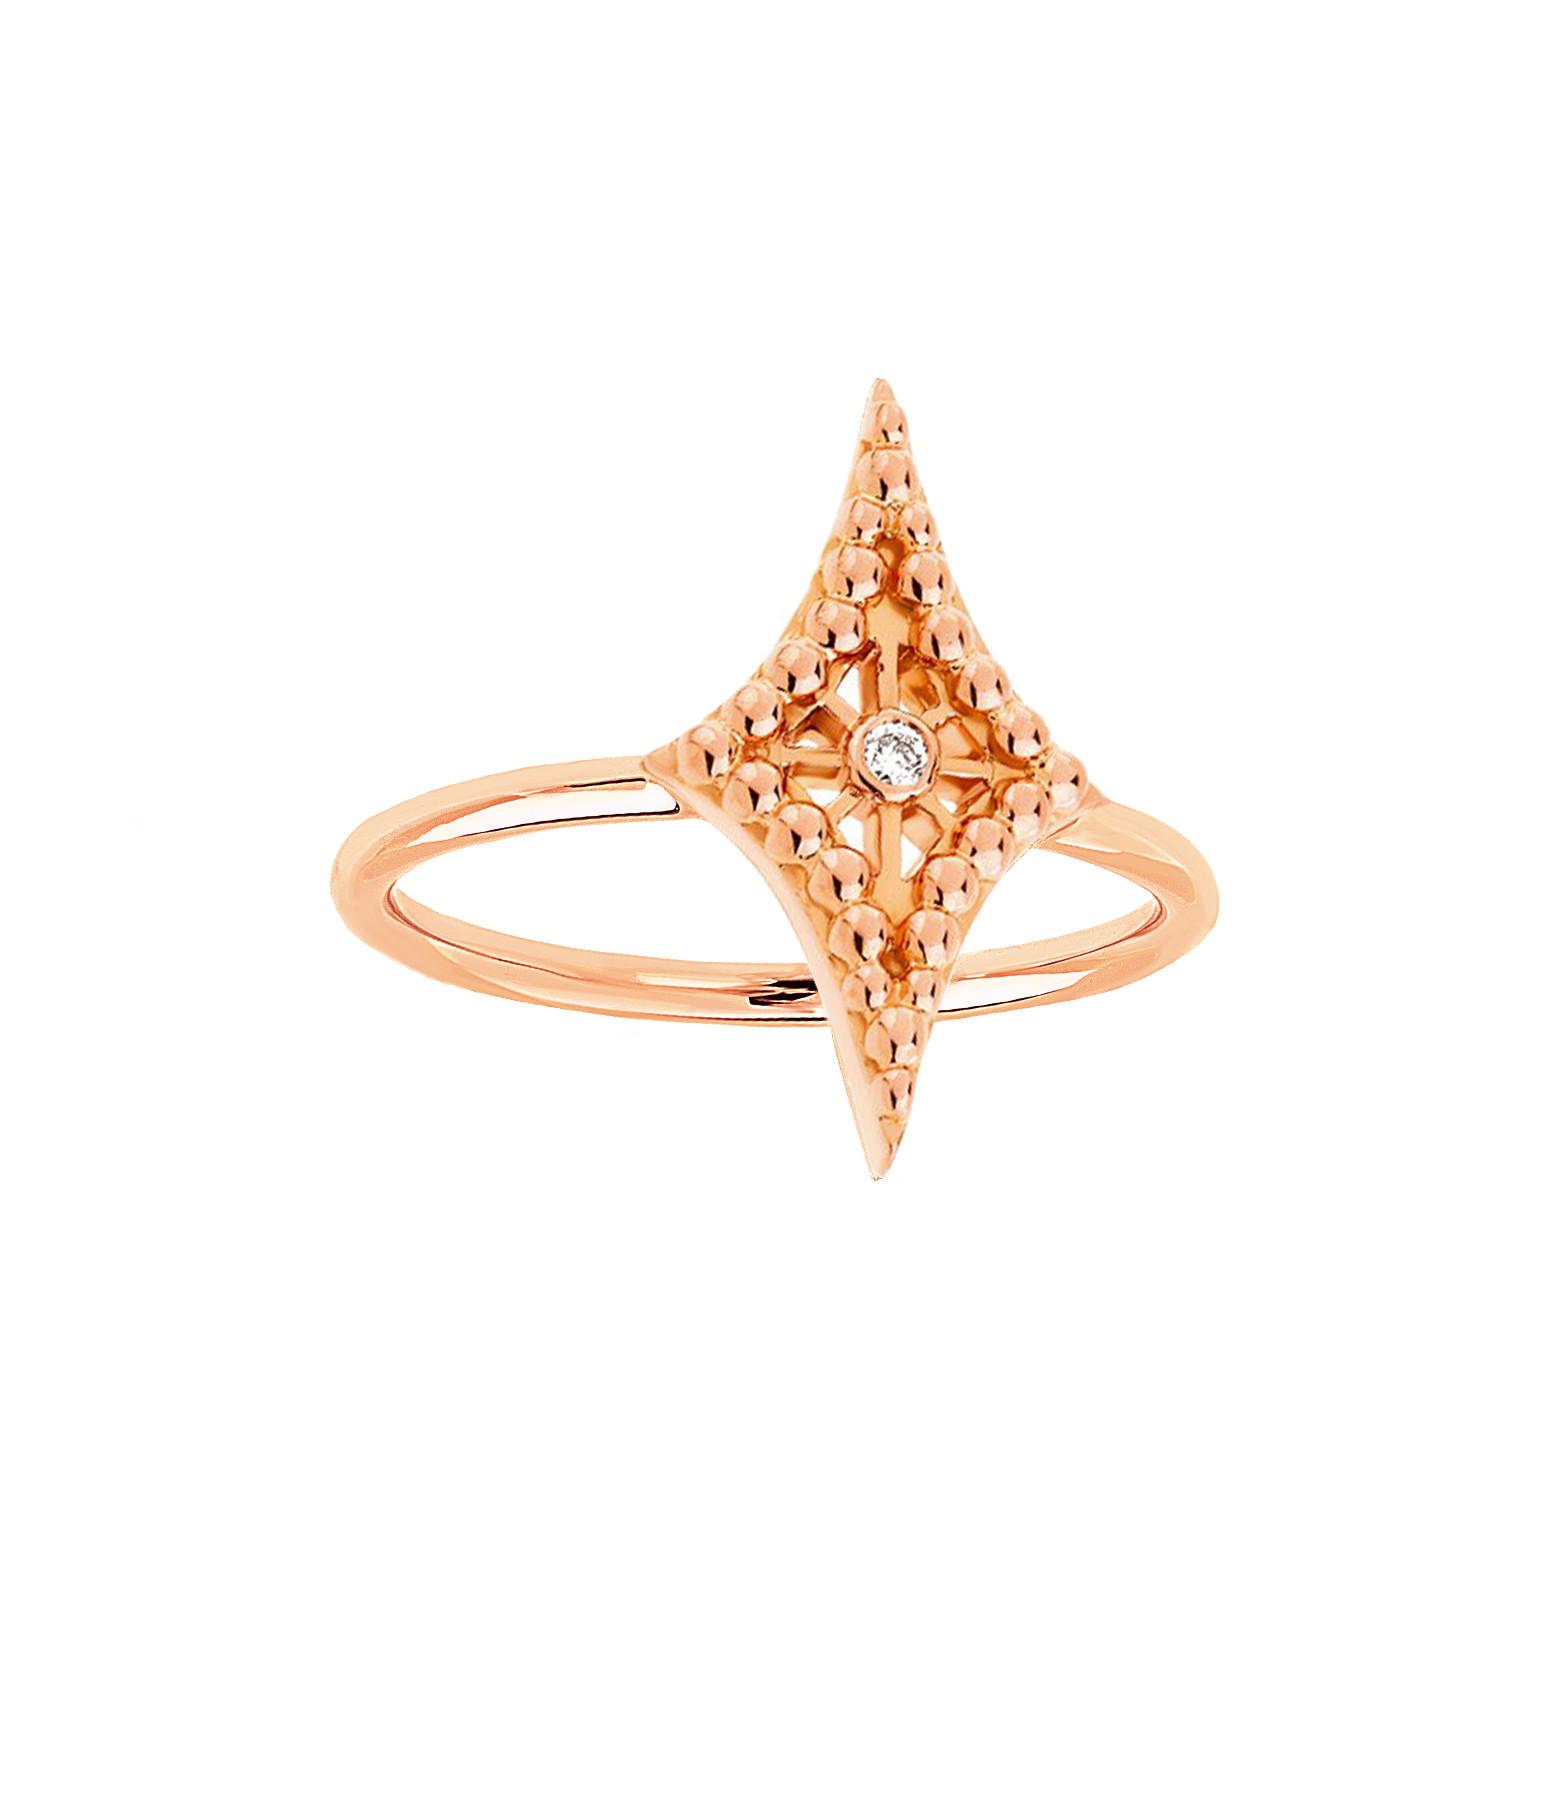 NAVA JOAILLERIE - Bague Mini-Cheyenne Losange Diamants Or Rose